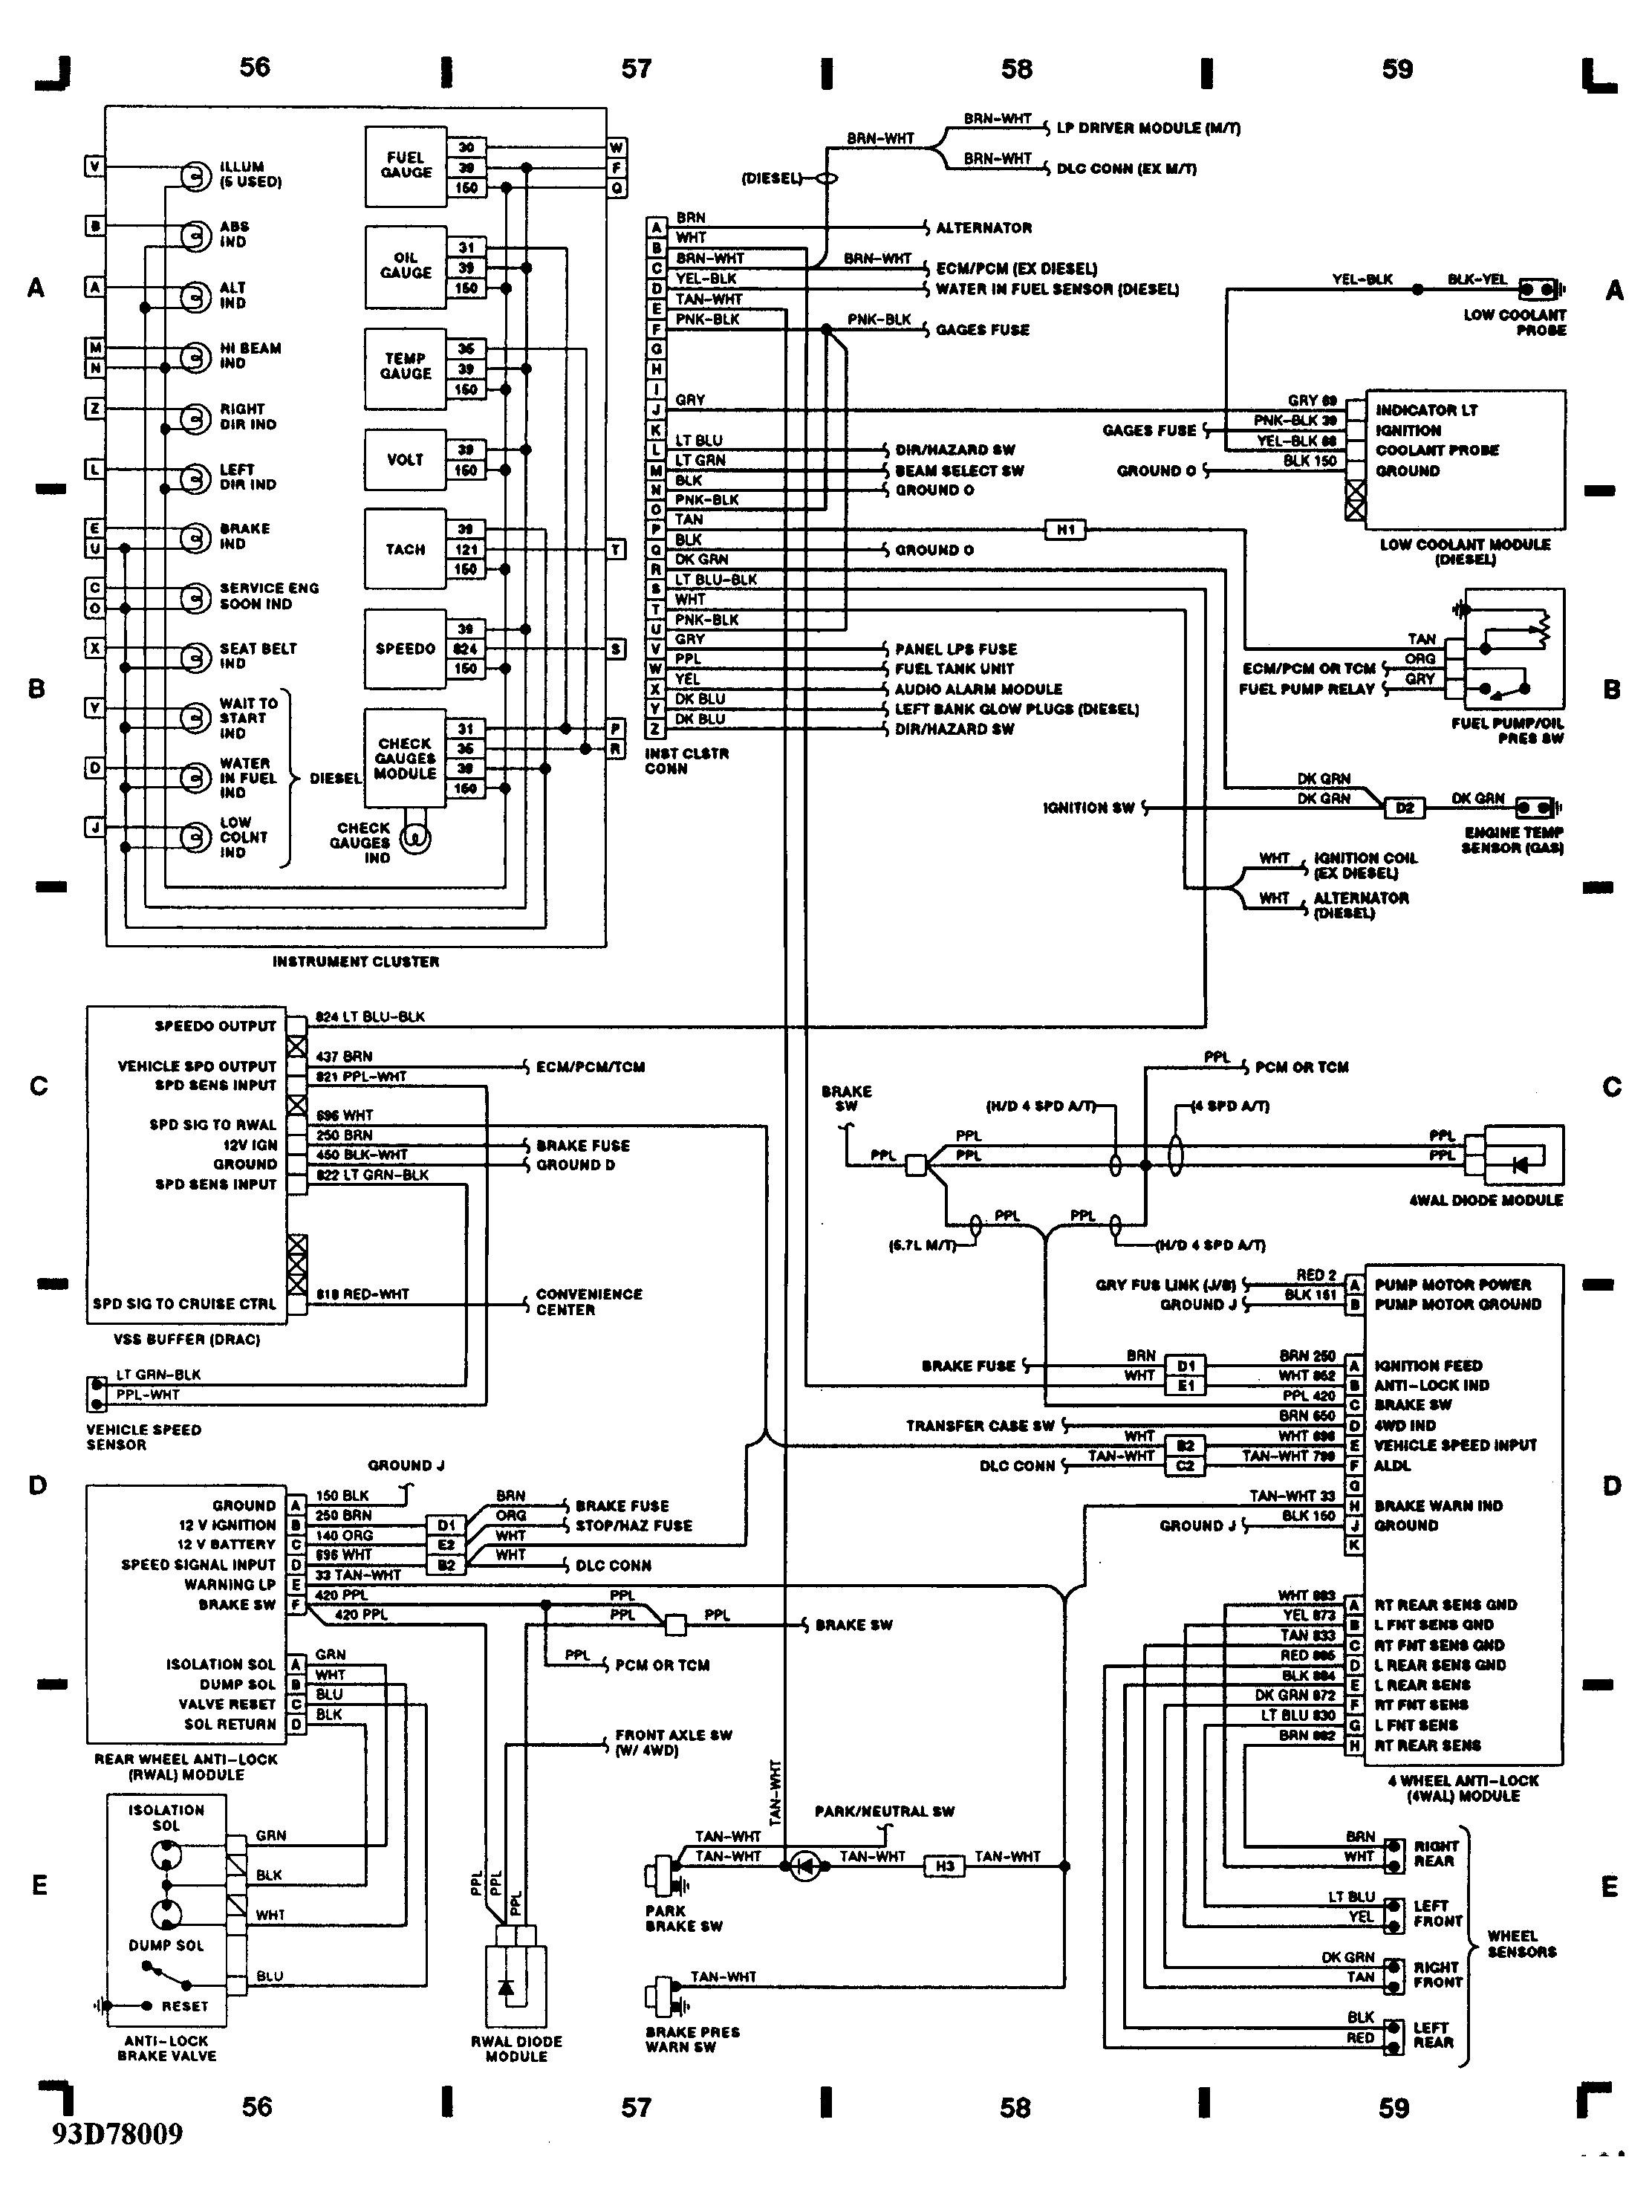 cat 3126 engine diagram wiring library detailed rh 9 awkw semmler peter de cat engine service manual